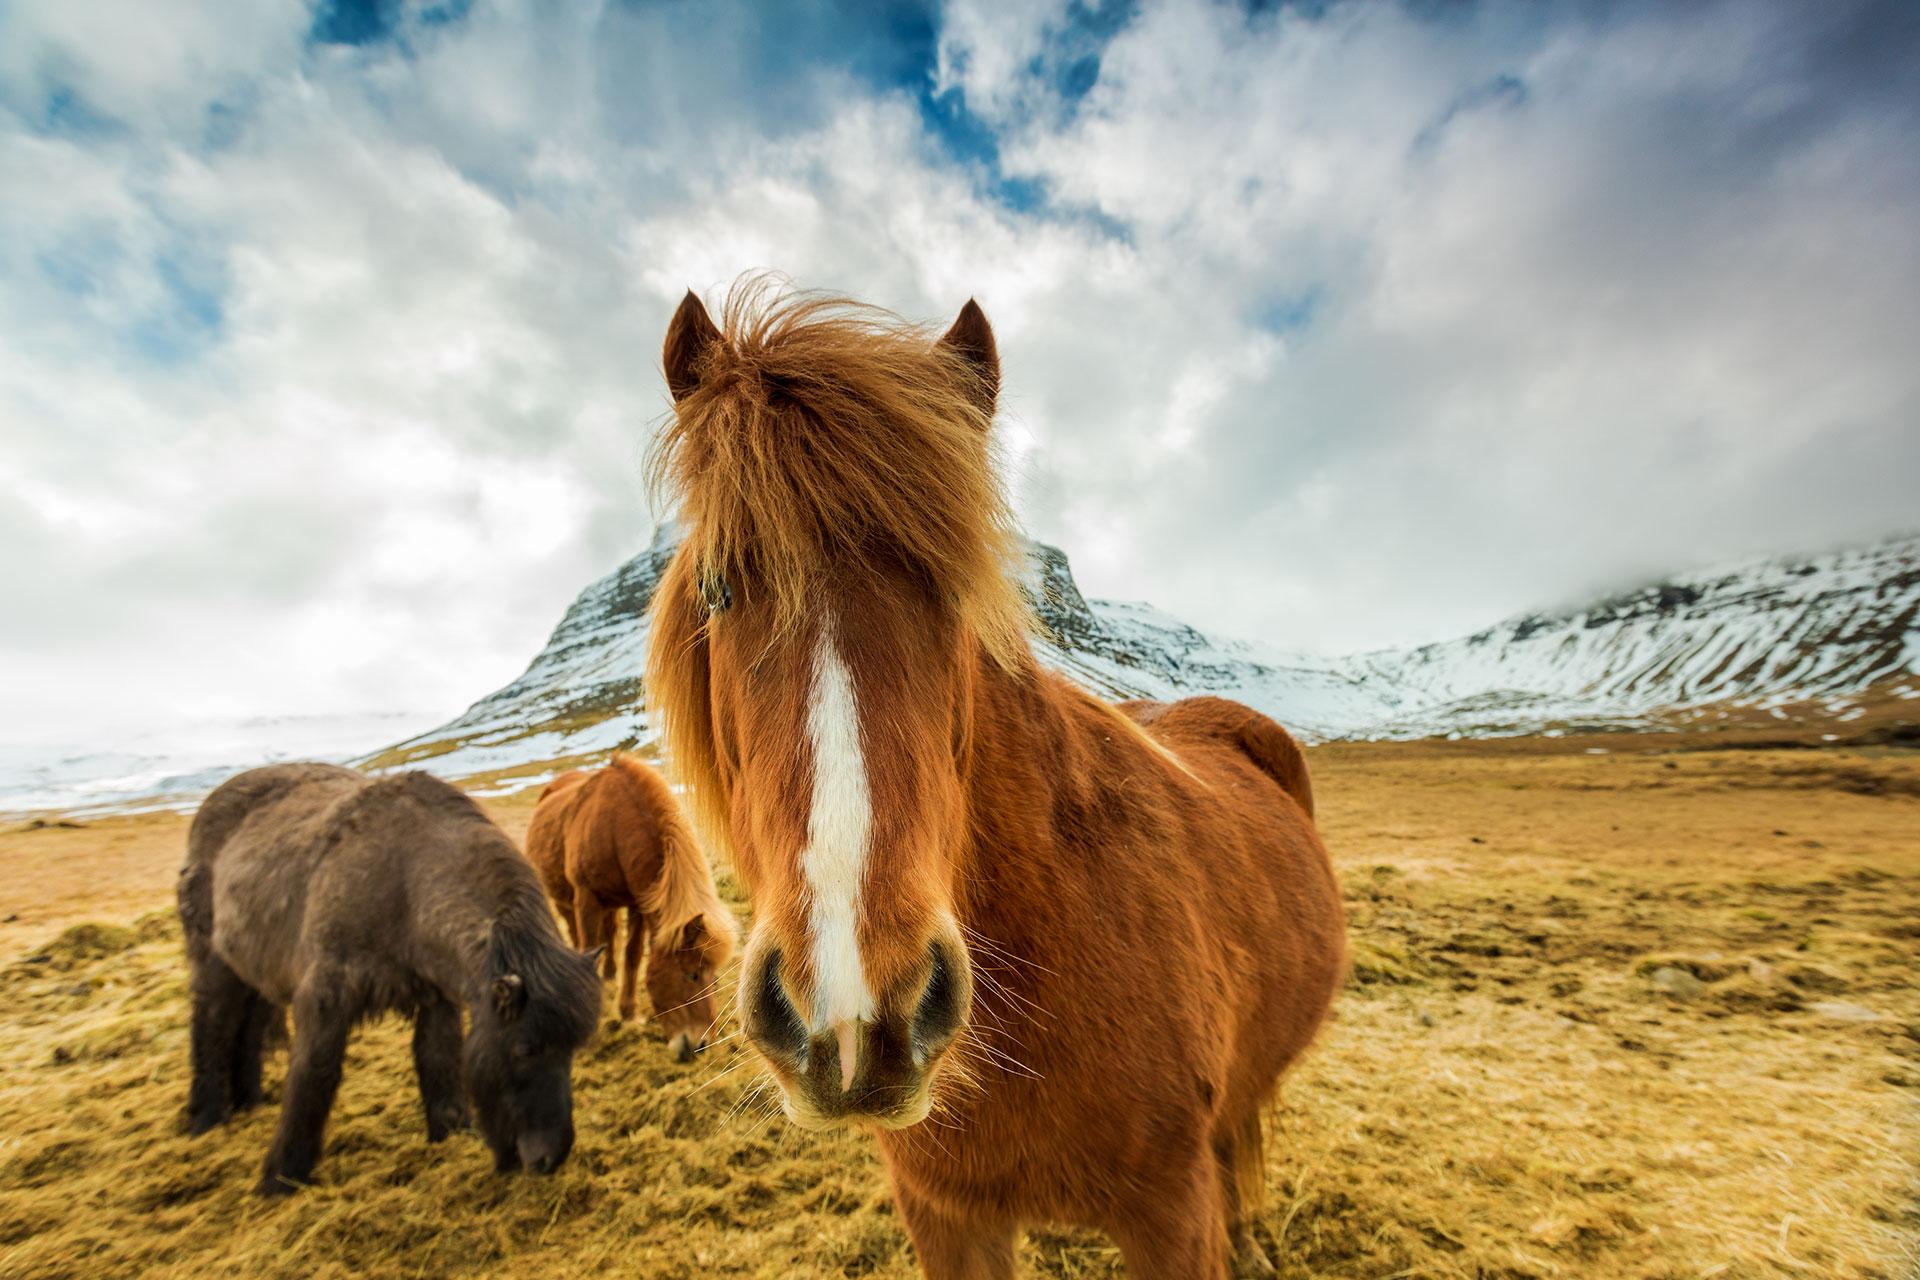 Icelandic Horses; Courtesy of Ververidis Vasilis/Shutterstock.com